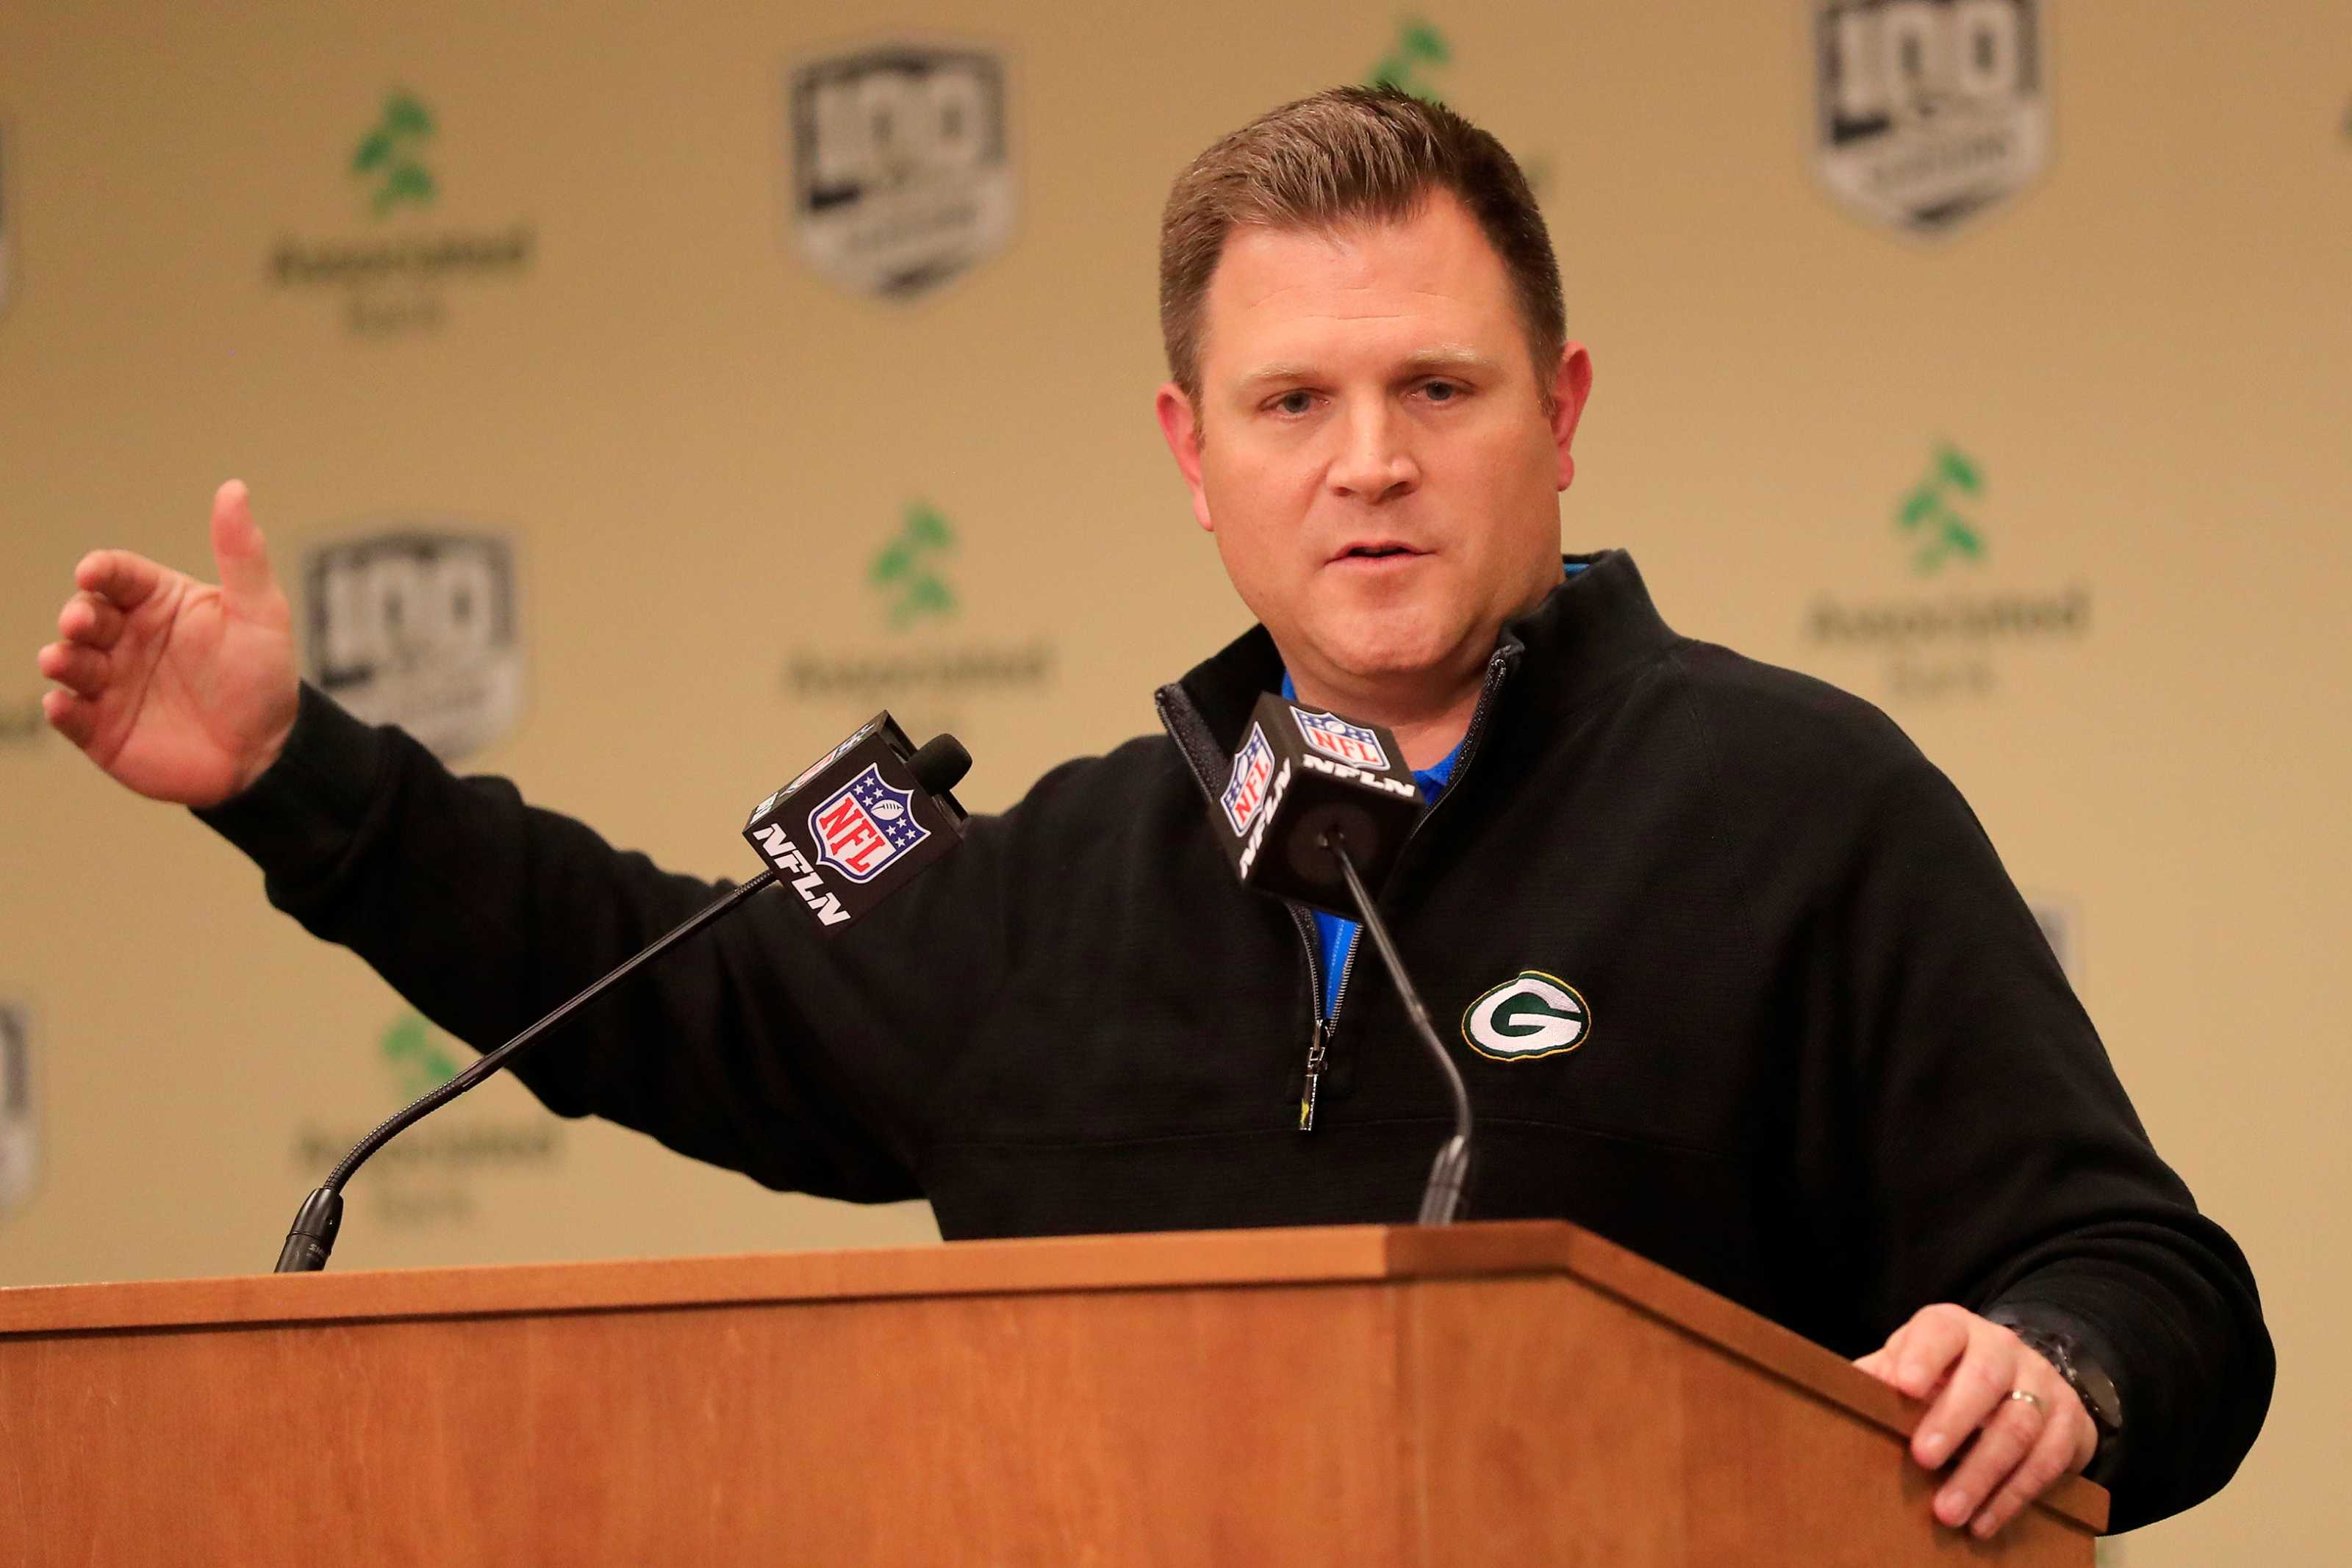 Green Bay Packers, Brian Gutekunst